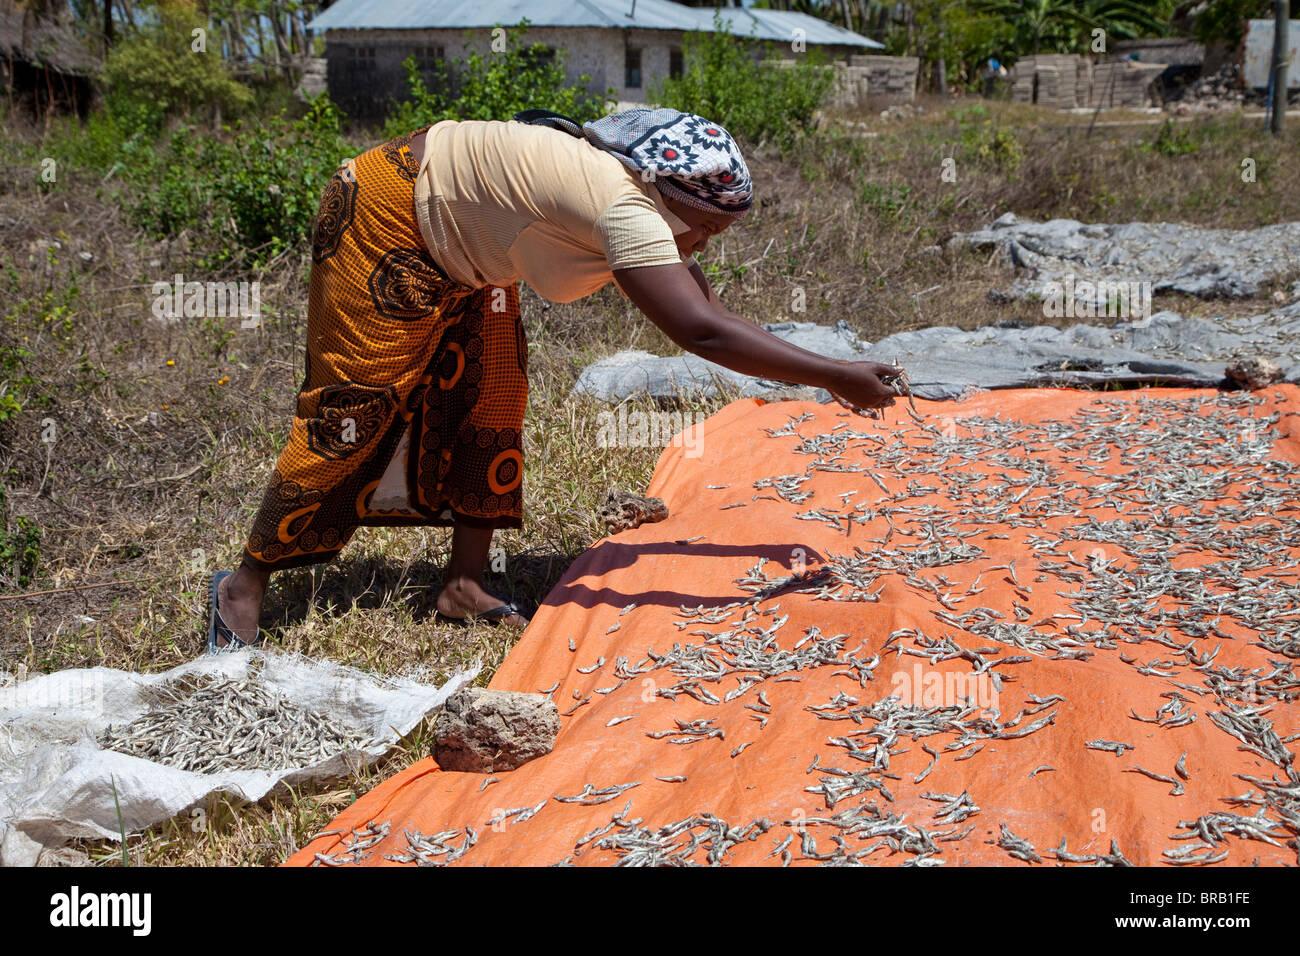 Zanzibar, Tanzania. Lady Spreading Anchovies to Dry in Sun. The lady wears a khanga cloth around her waist. - Stock Image